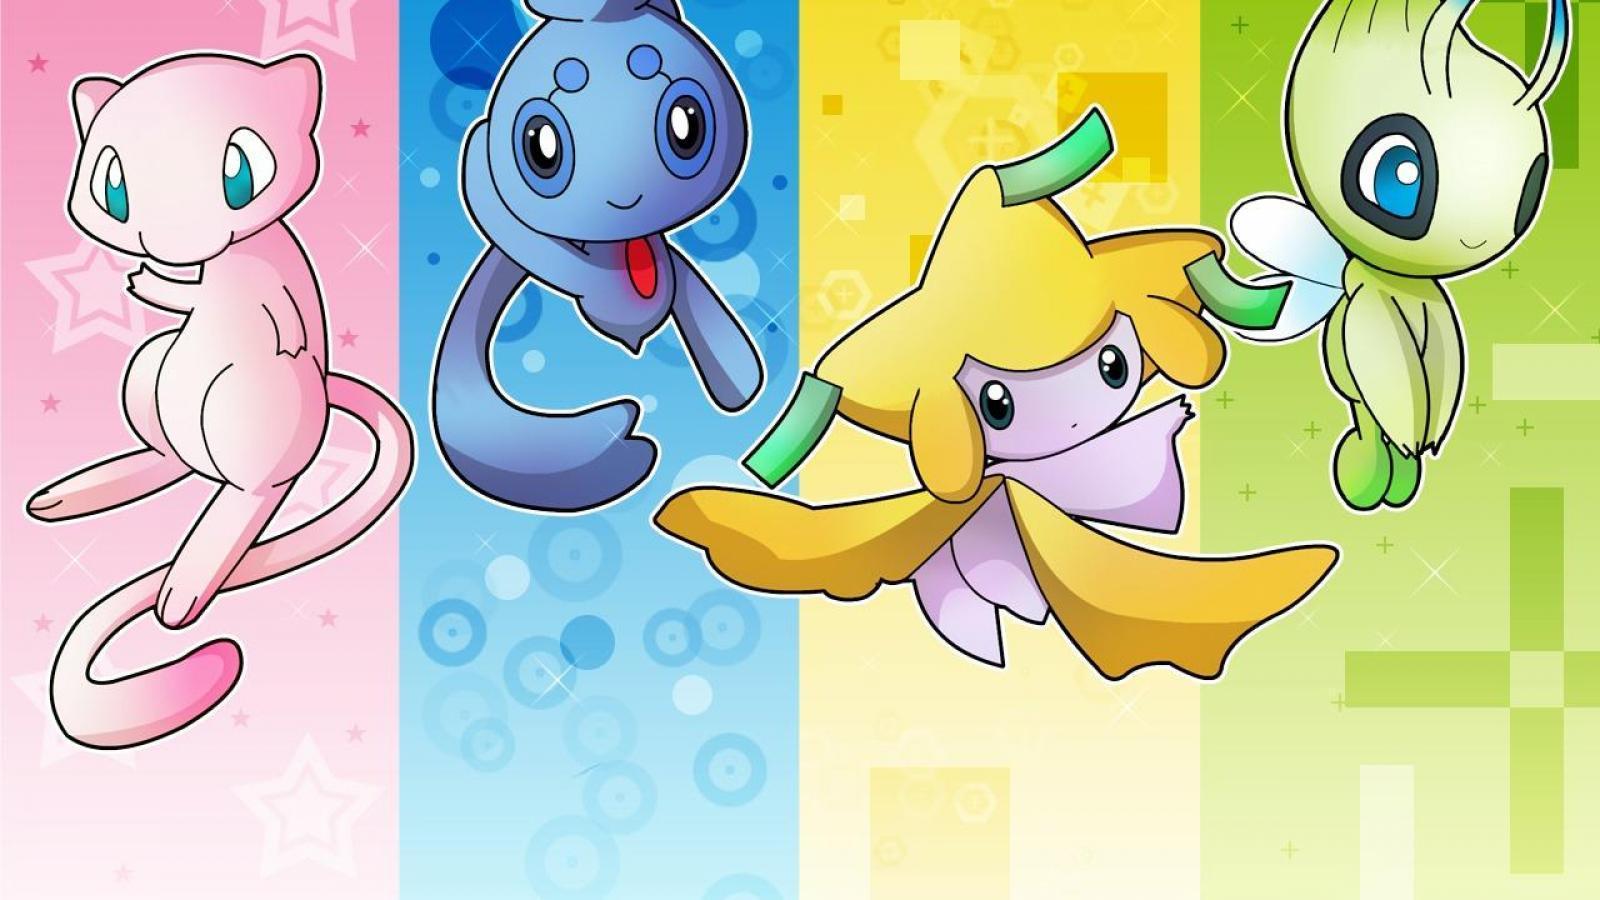 Mew Pokemon Wallpapers 1600x900